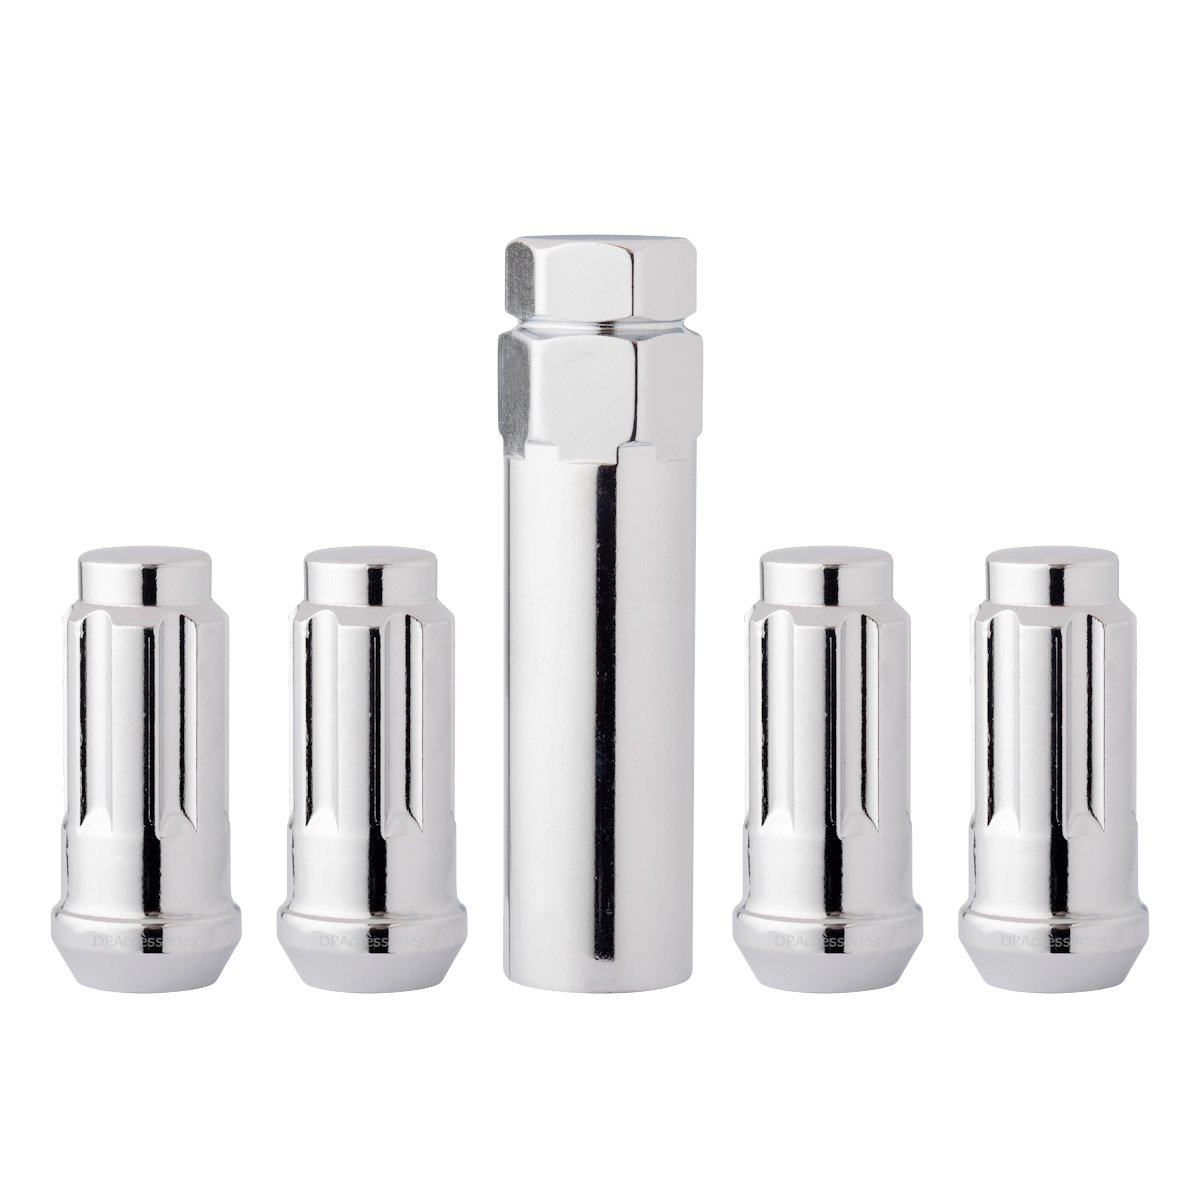 DPAccessories LCS4N8HC-CH04LK4 Chrome Wheel Locks 14x1.5 Closed End XL Spline Tuner Locking Lug Nuts - Dual Hex Wheel Lock Set